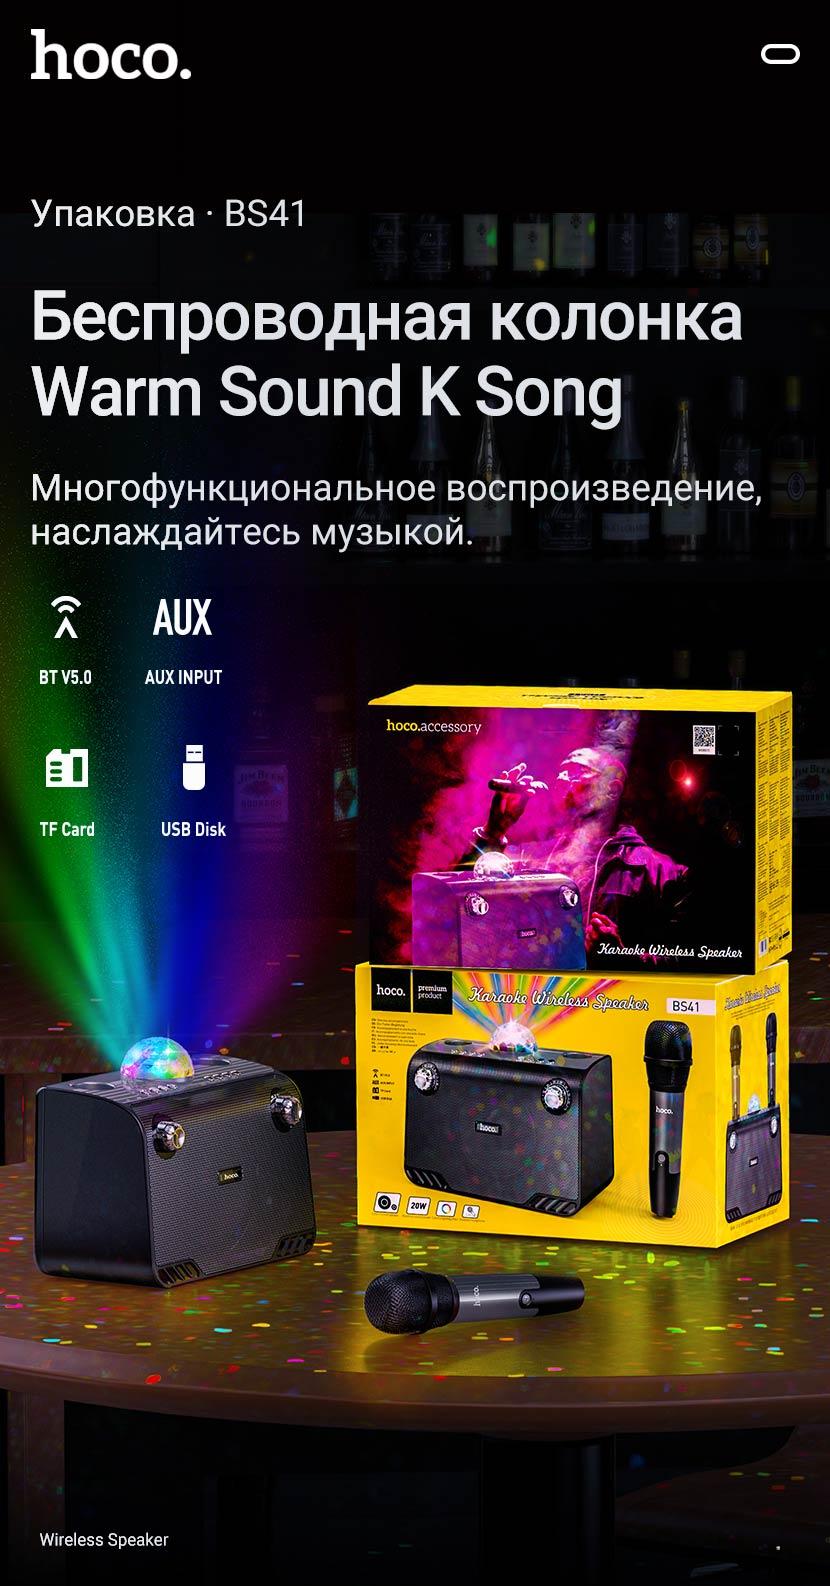 hoco news bs41 warm sound k song wireless speaker package ru